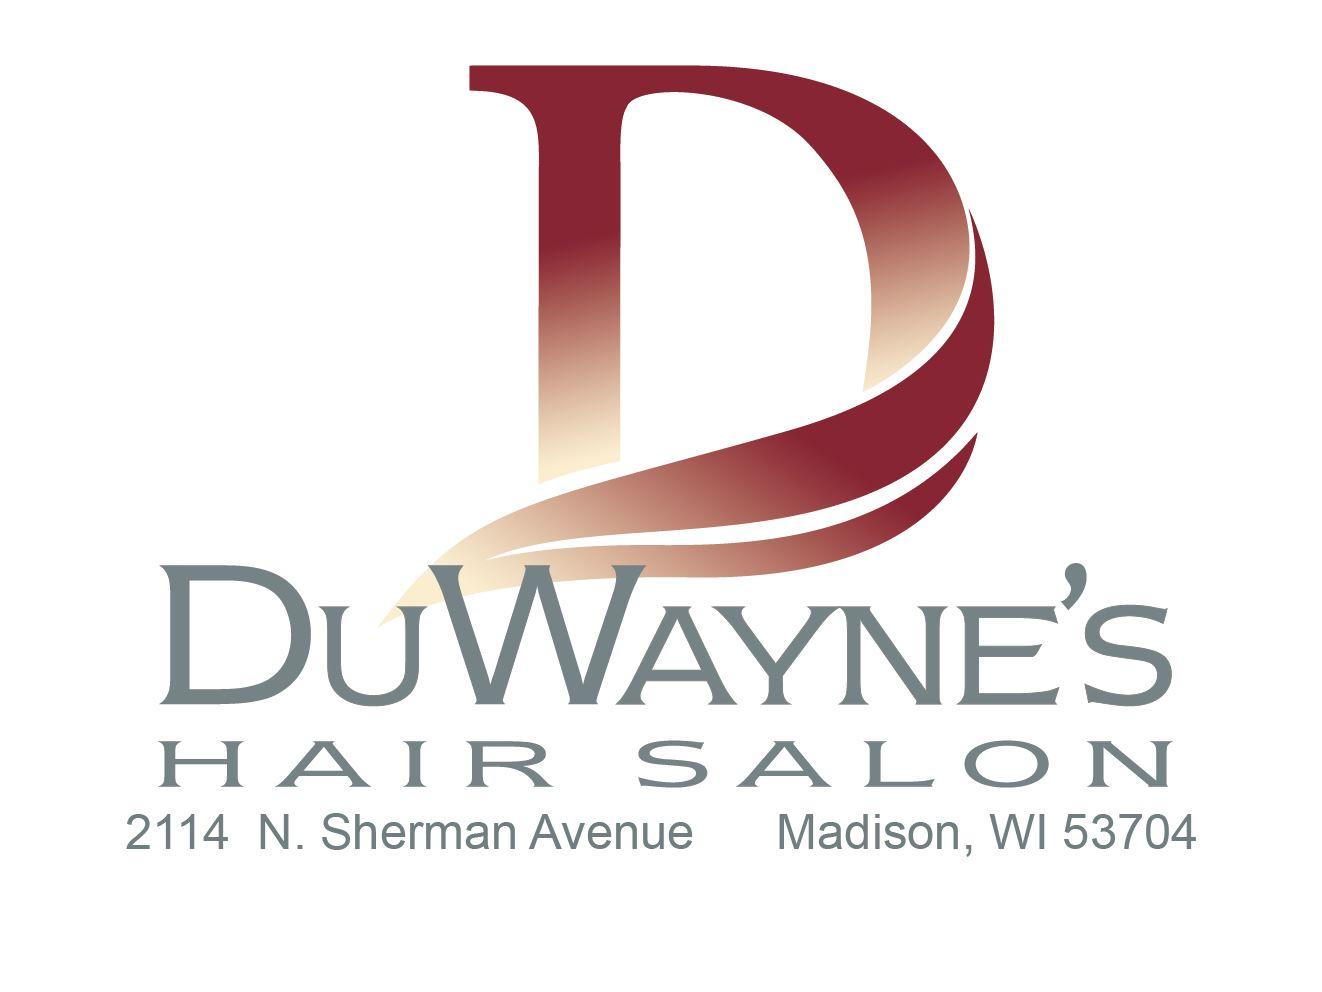 Duwaynes Salon Duwaynes Salon Hair Salon Madison Wi